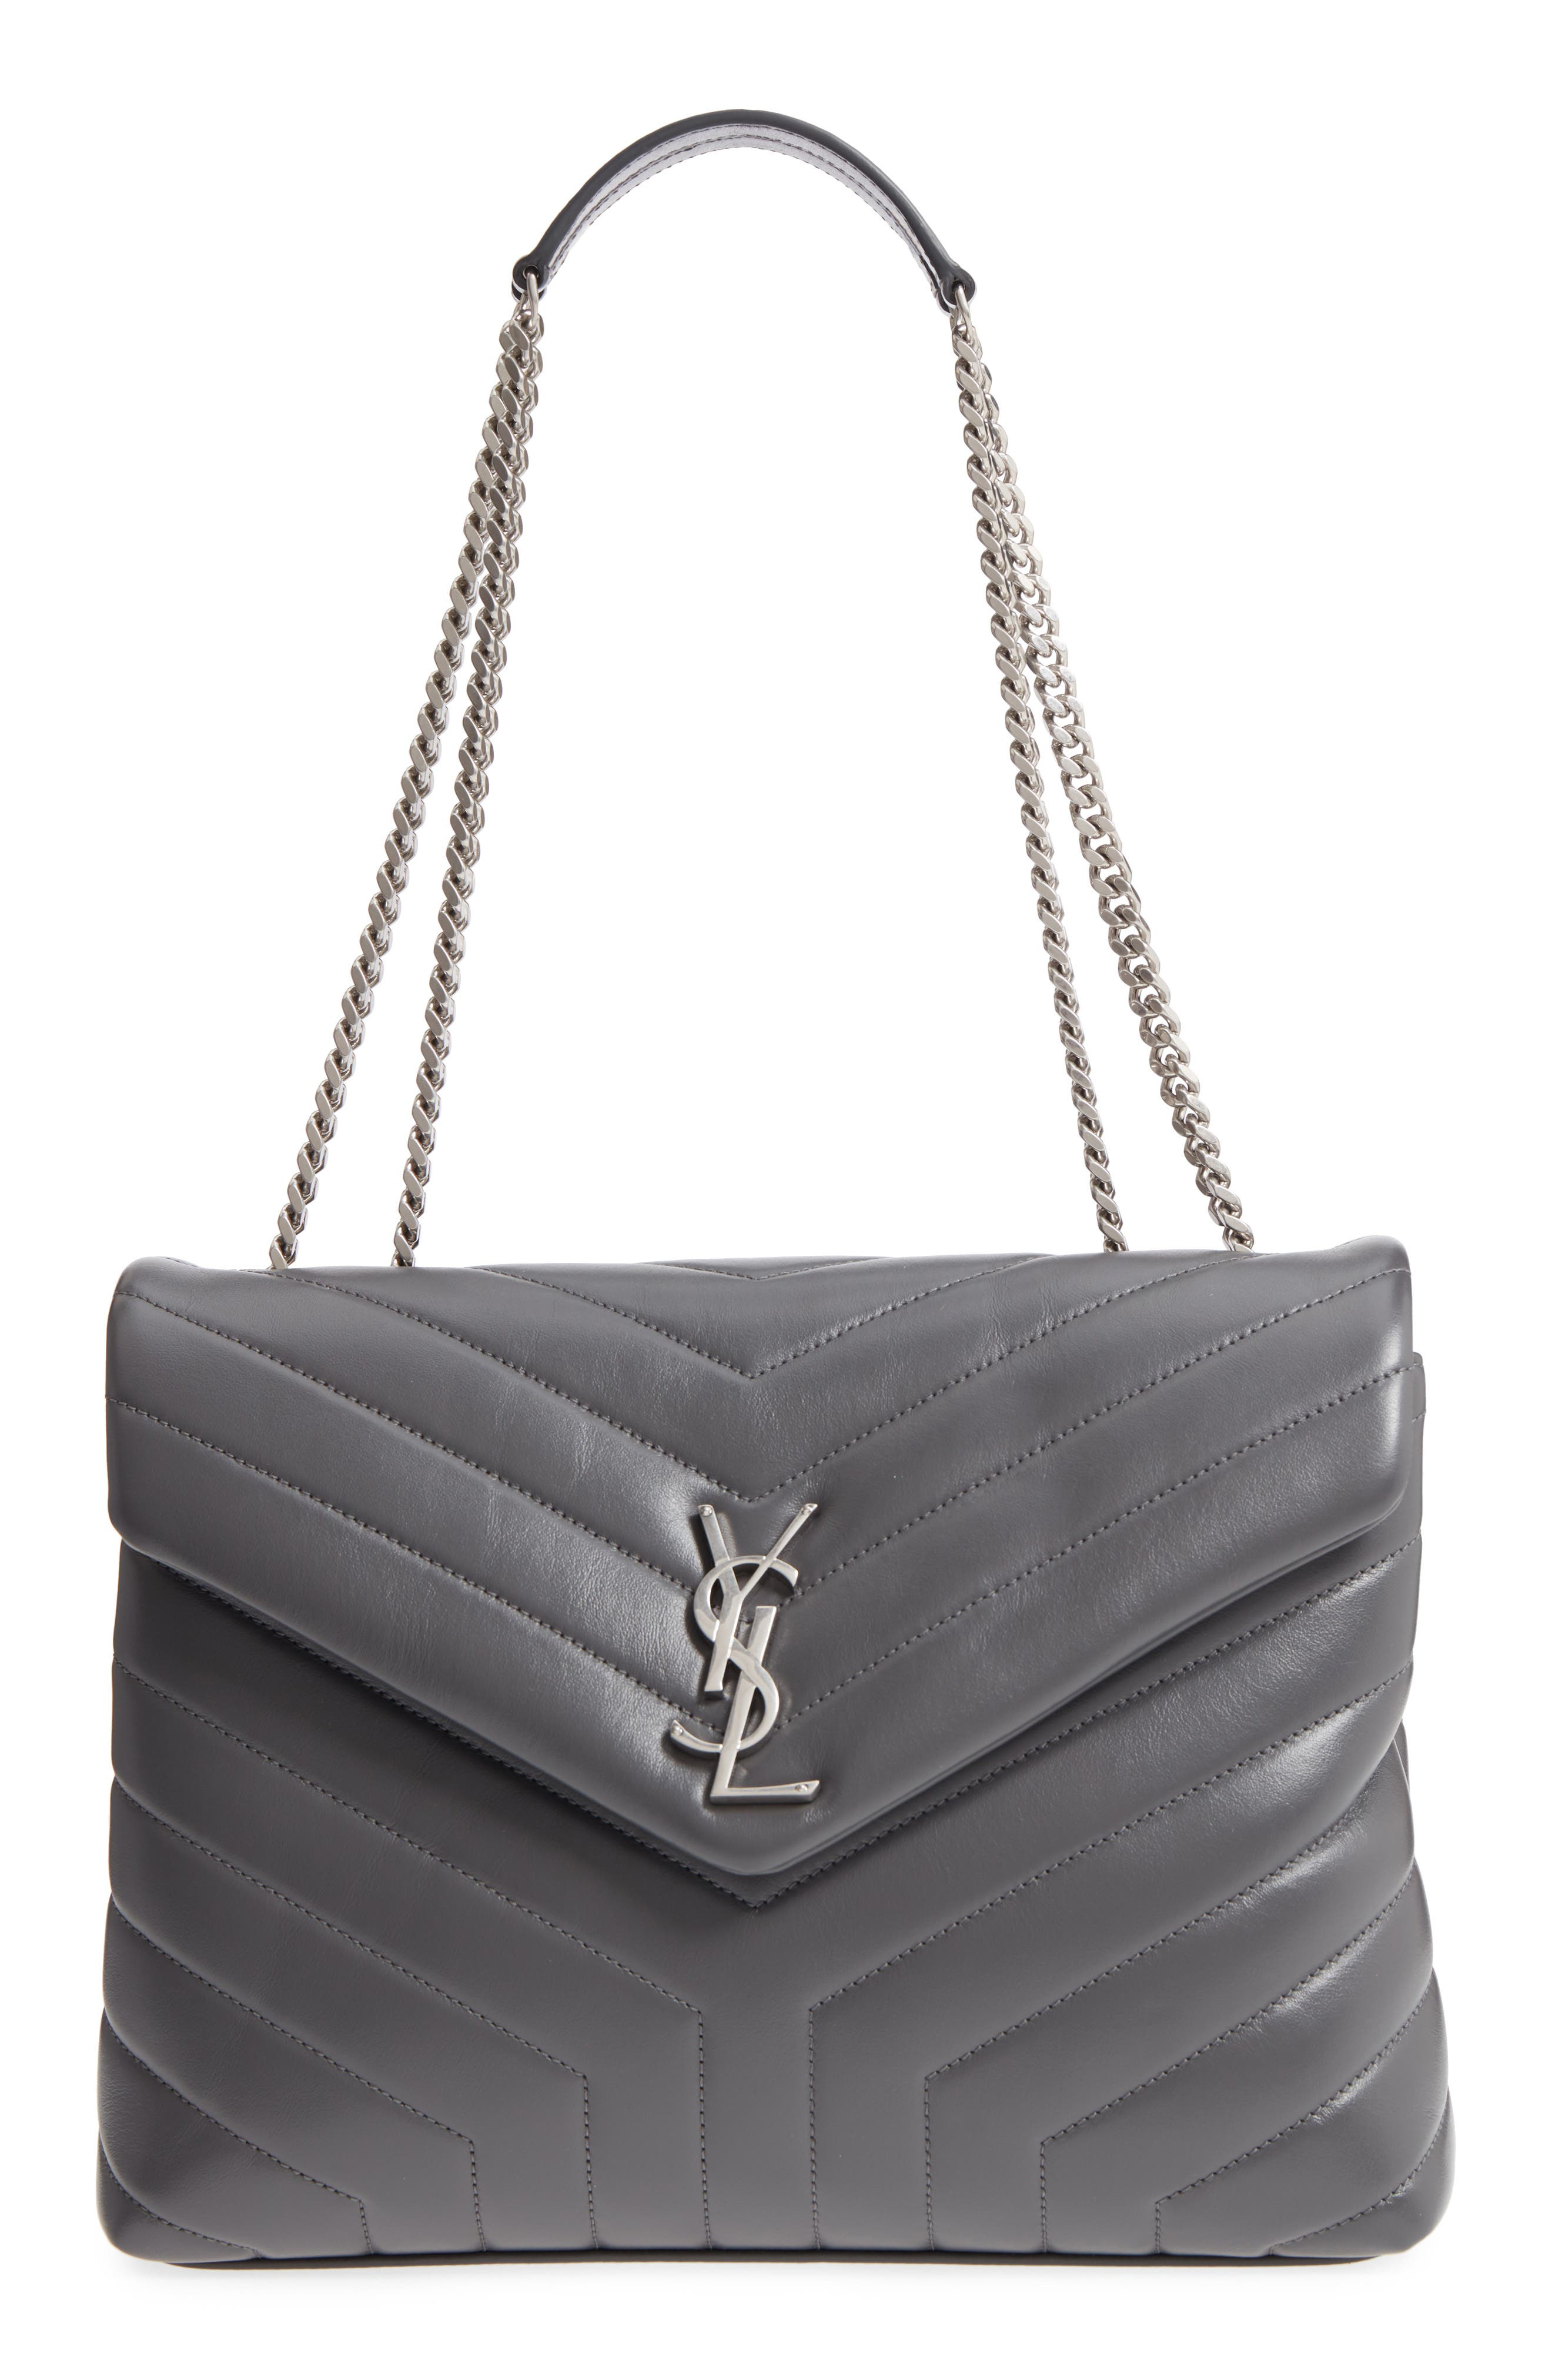 Medium Loulou Calfskin Leather Shoulder Bag,                             Main thumbnail 1, color,                             STORM/ STORM